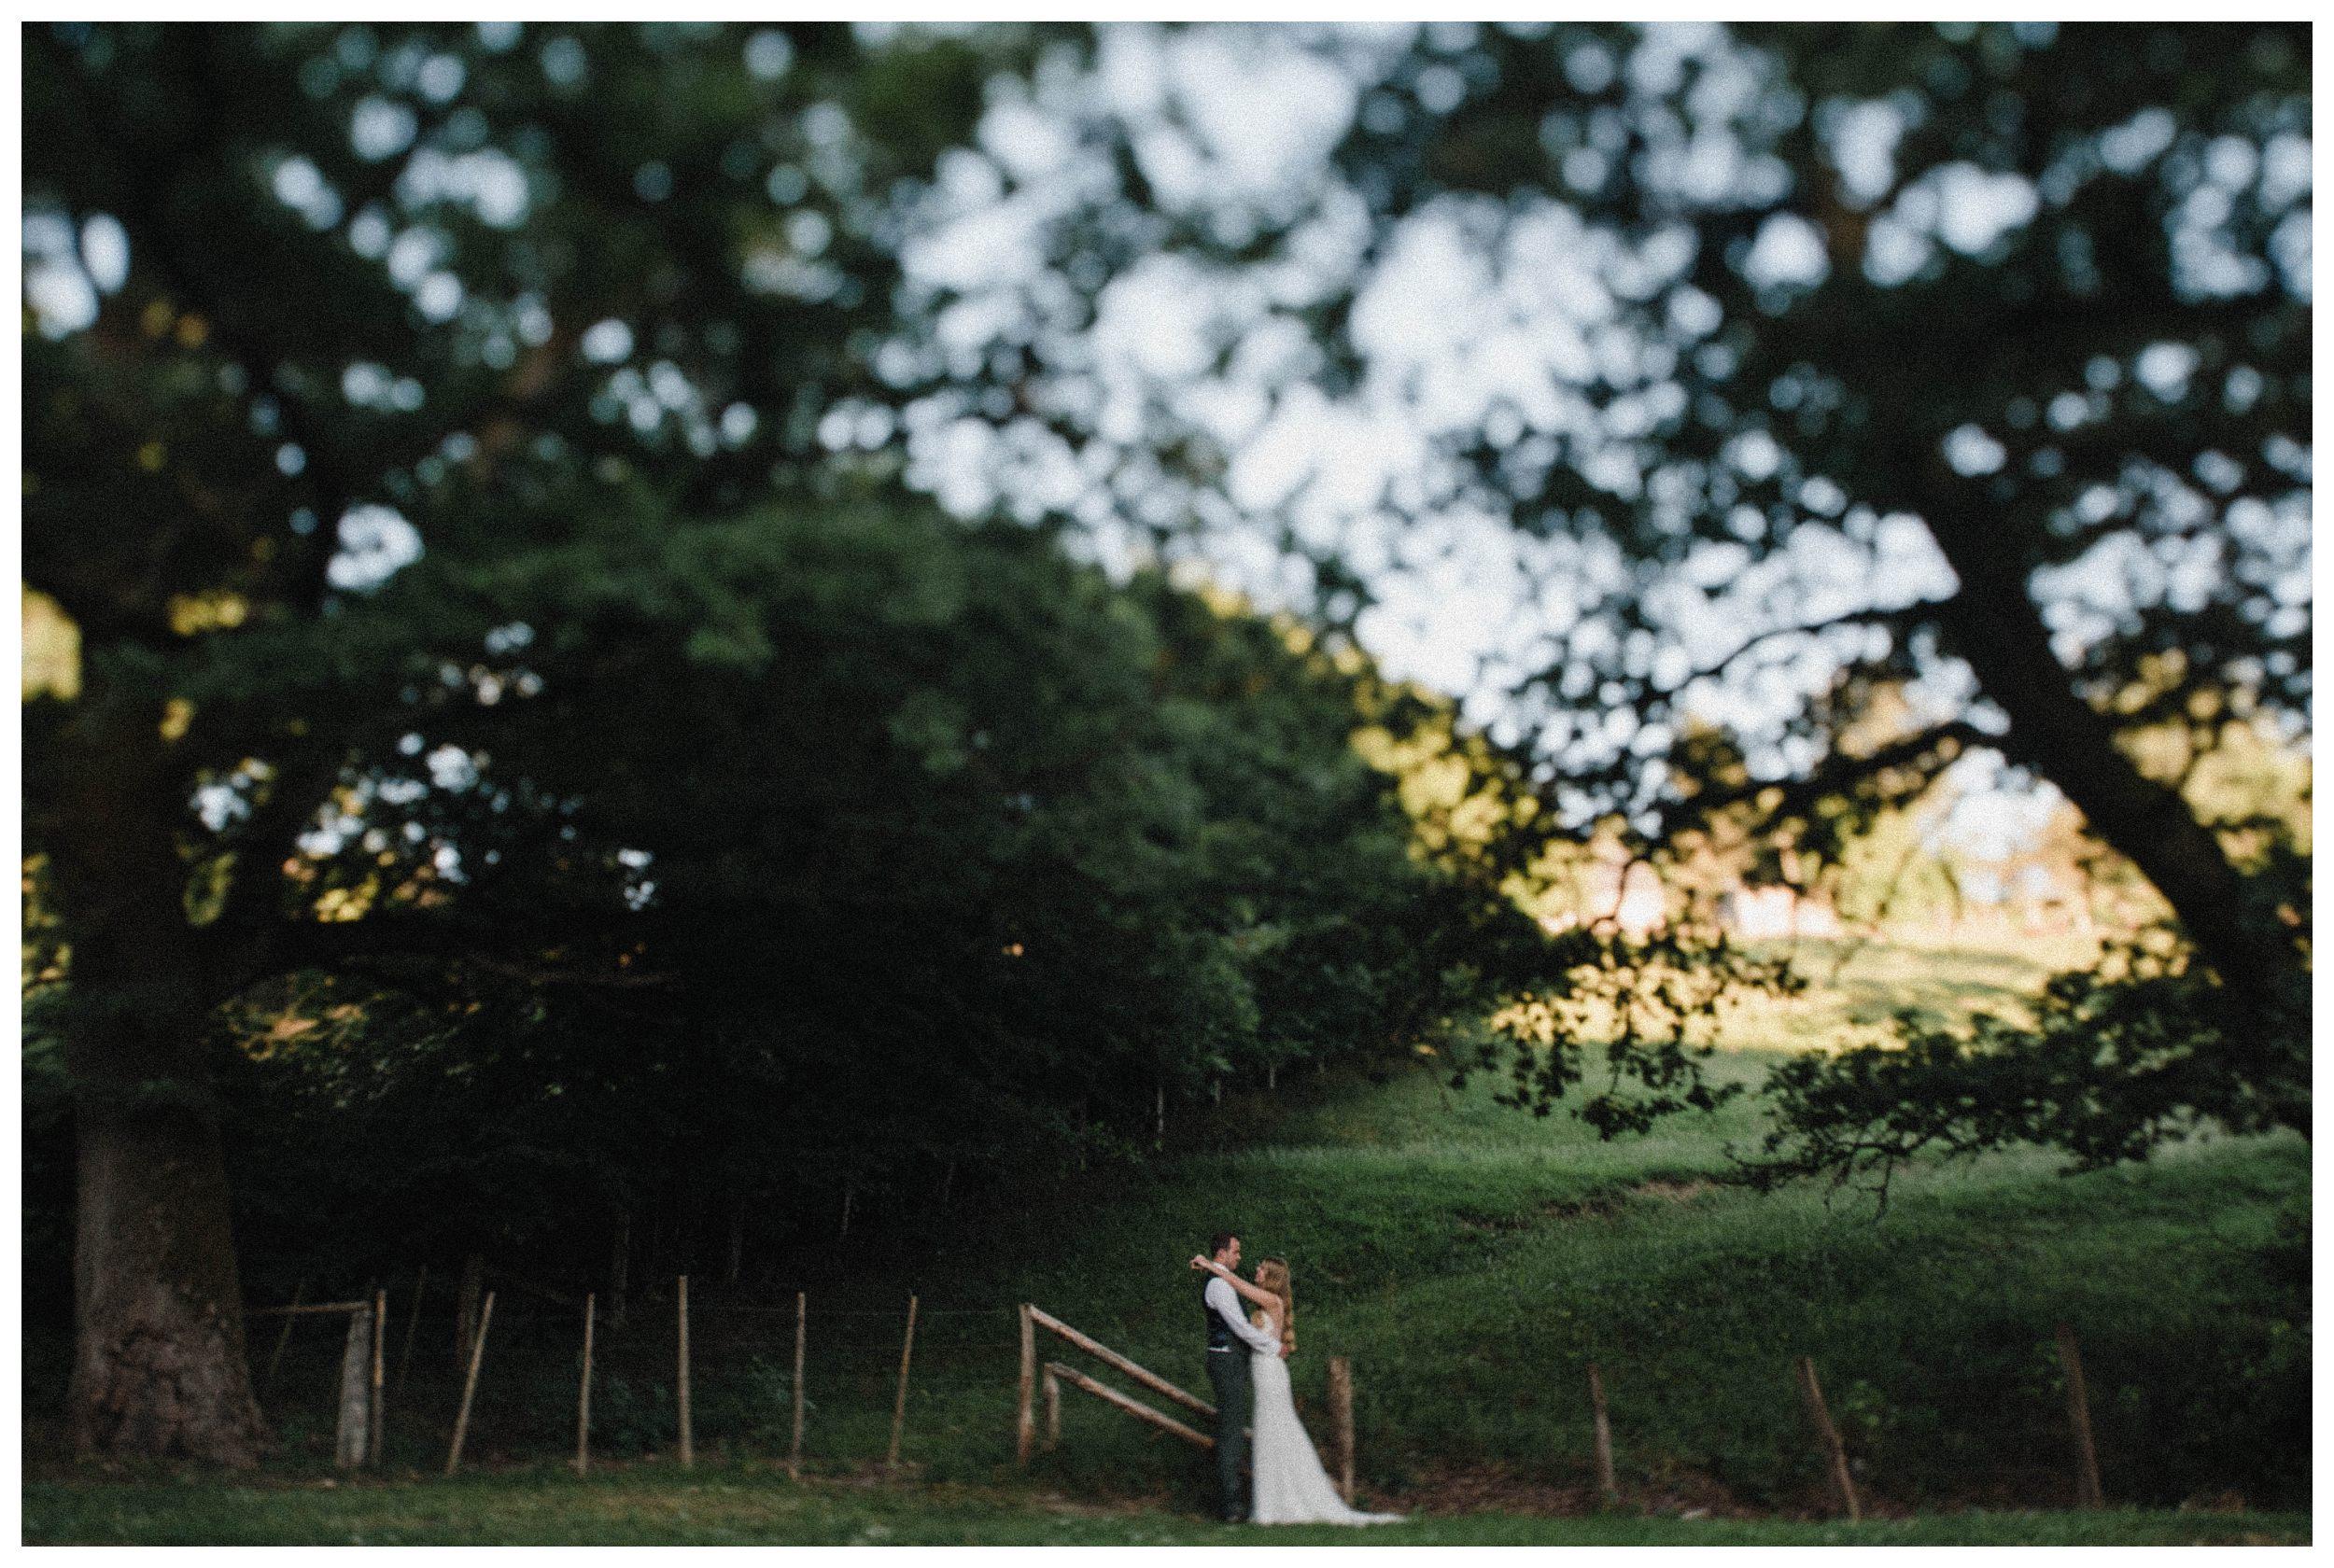 huwelijksfotograaf bruidsfotograaf destinationwedding huwelijksfotografie in ardennen nederland (80).jpg